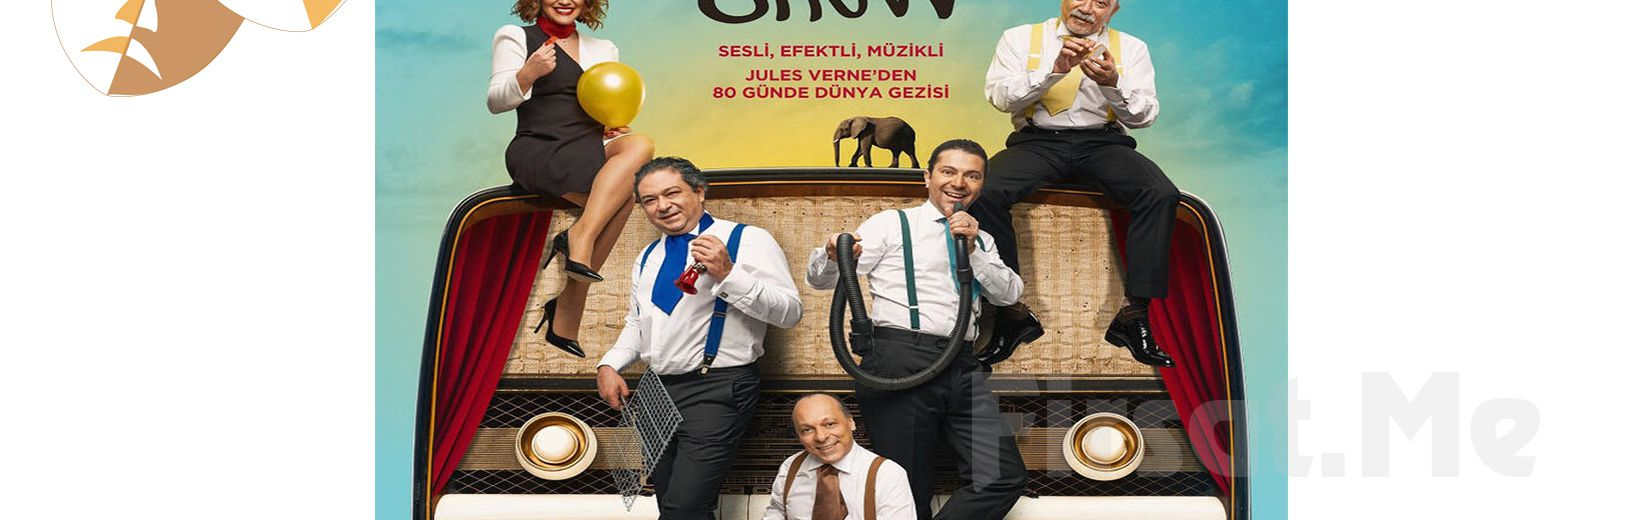 Radyodan Sahneye Muhteşem Komedi 'Radyatro Show' Tiyatro Oyunu Bileti